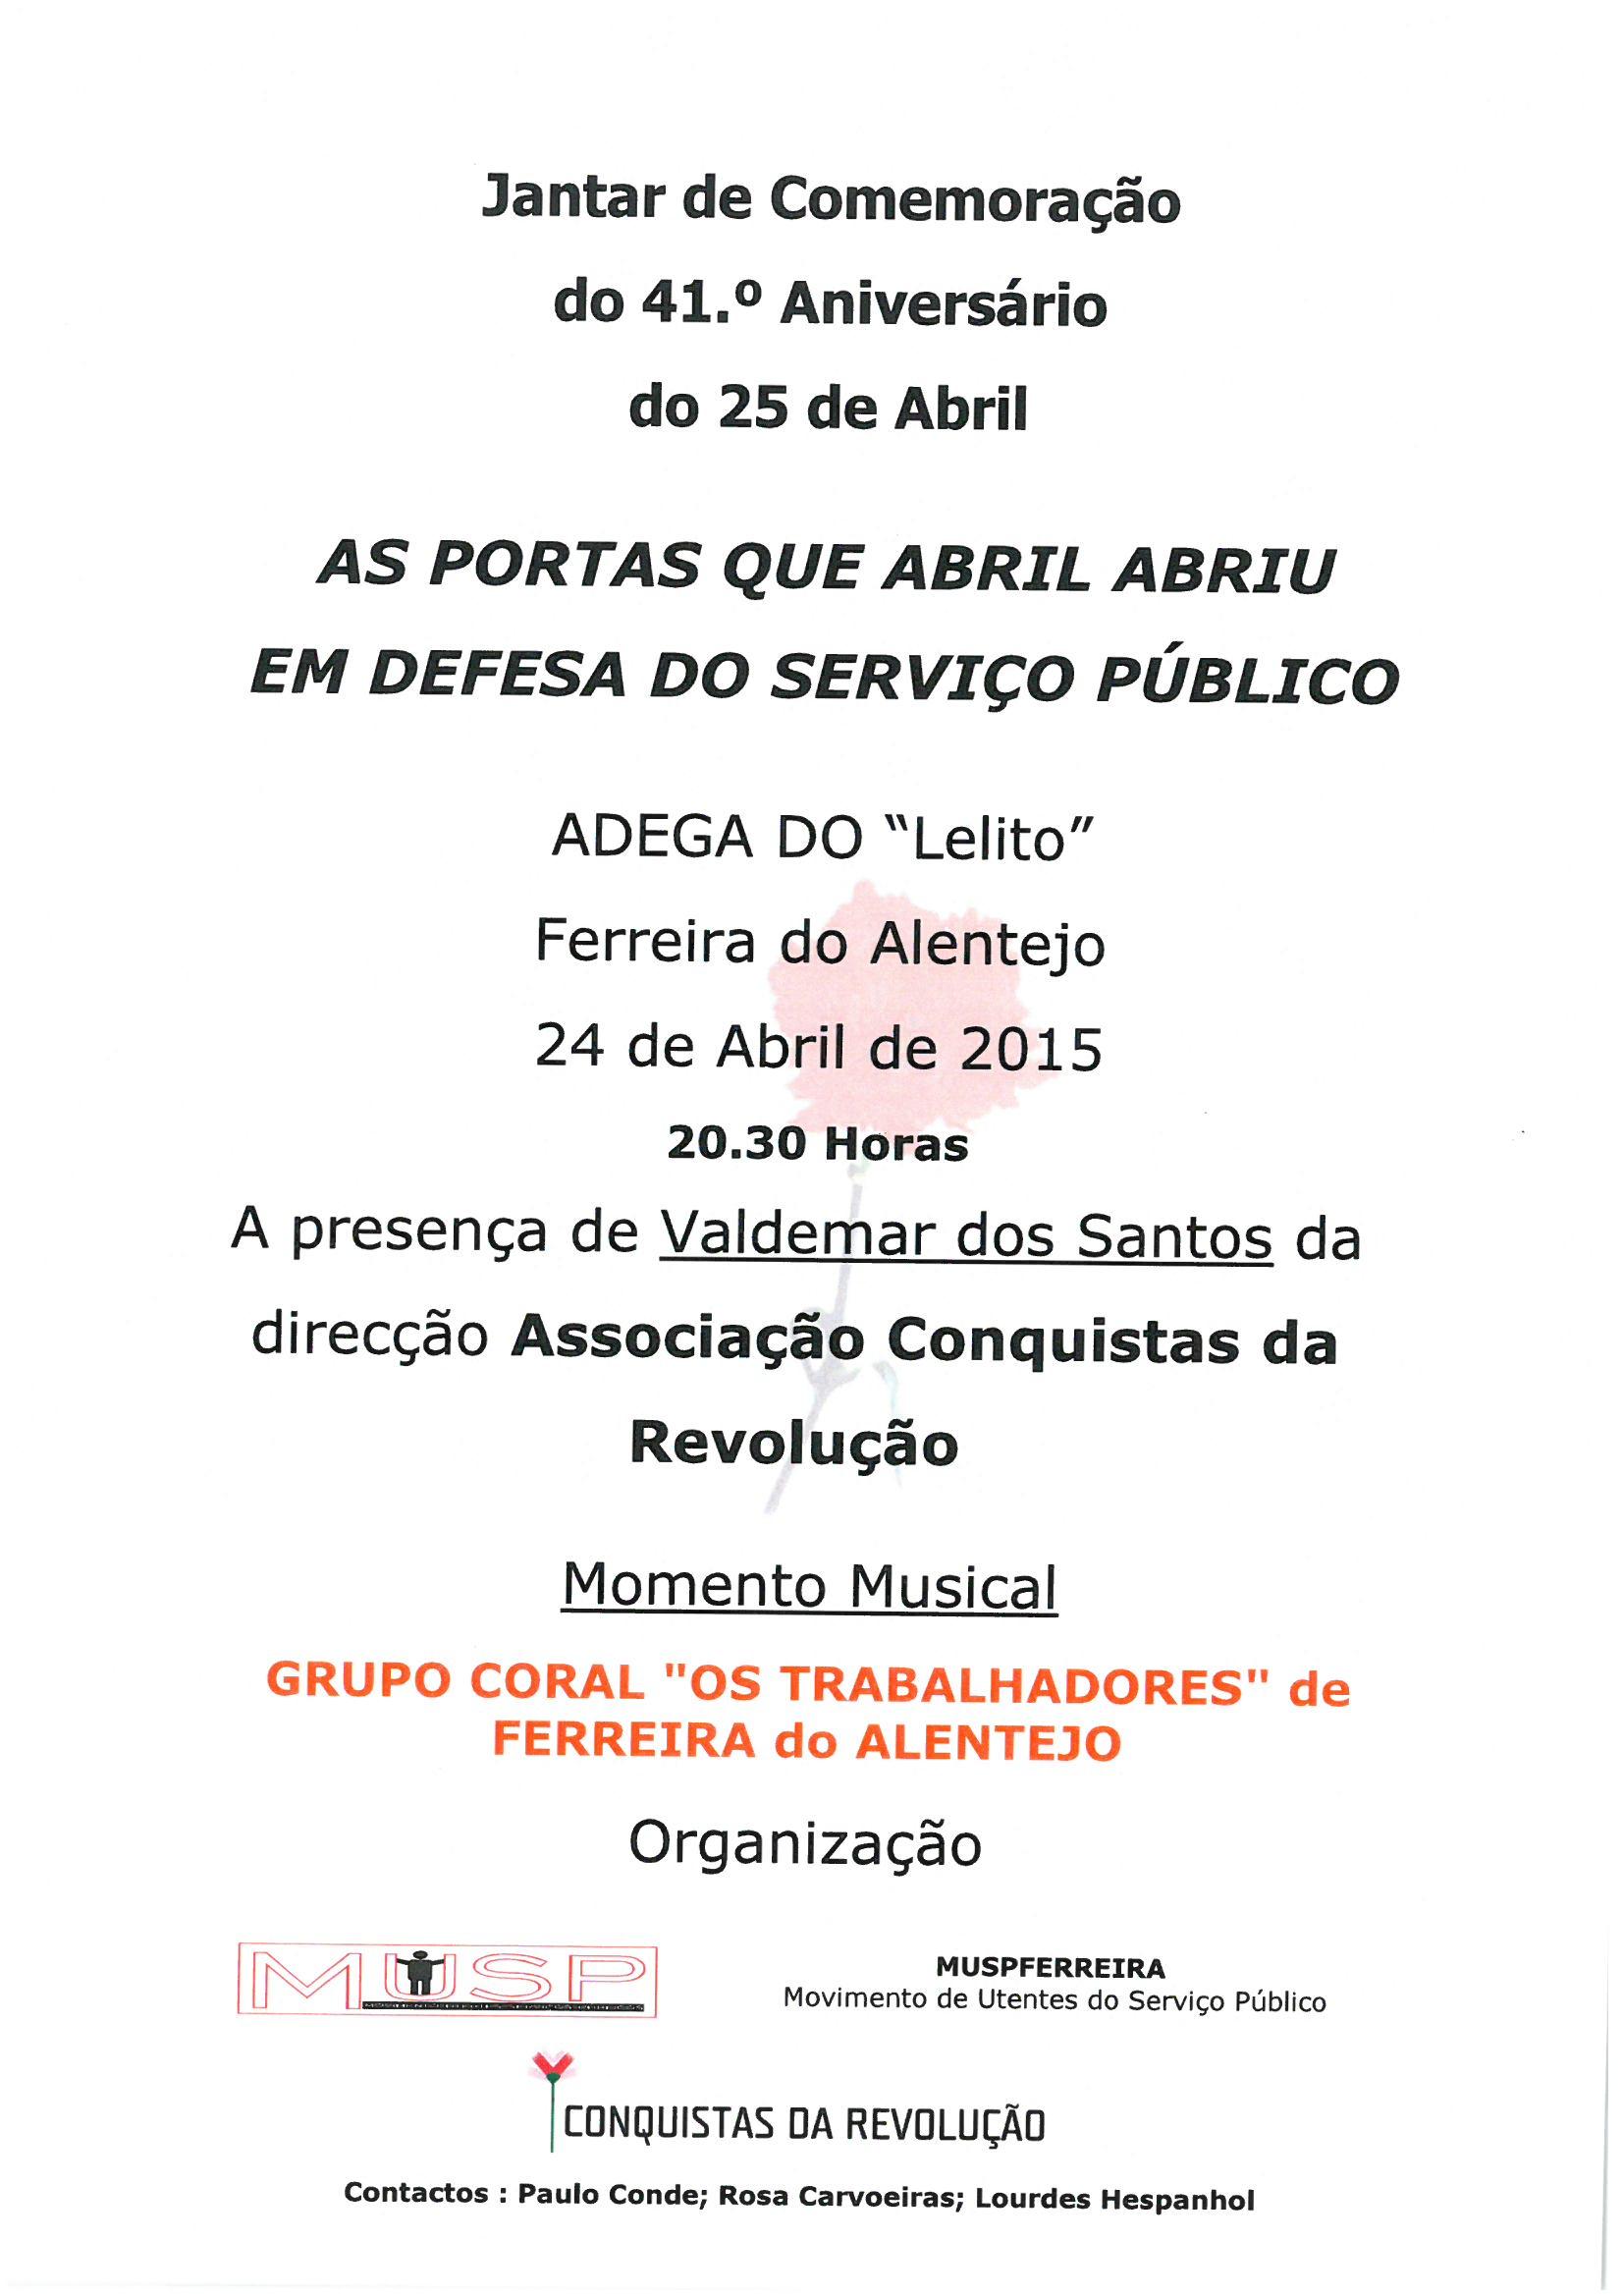 Ferreira Alentejo 2015-04-25